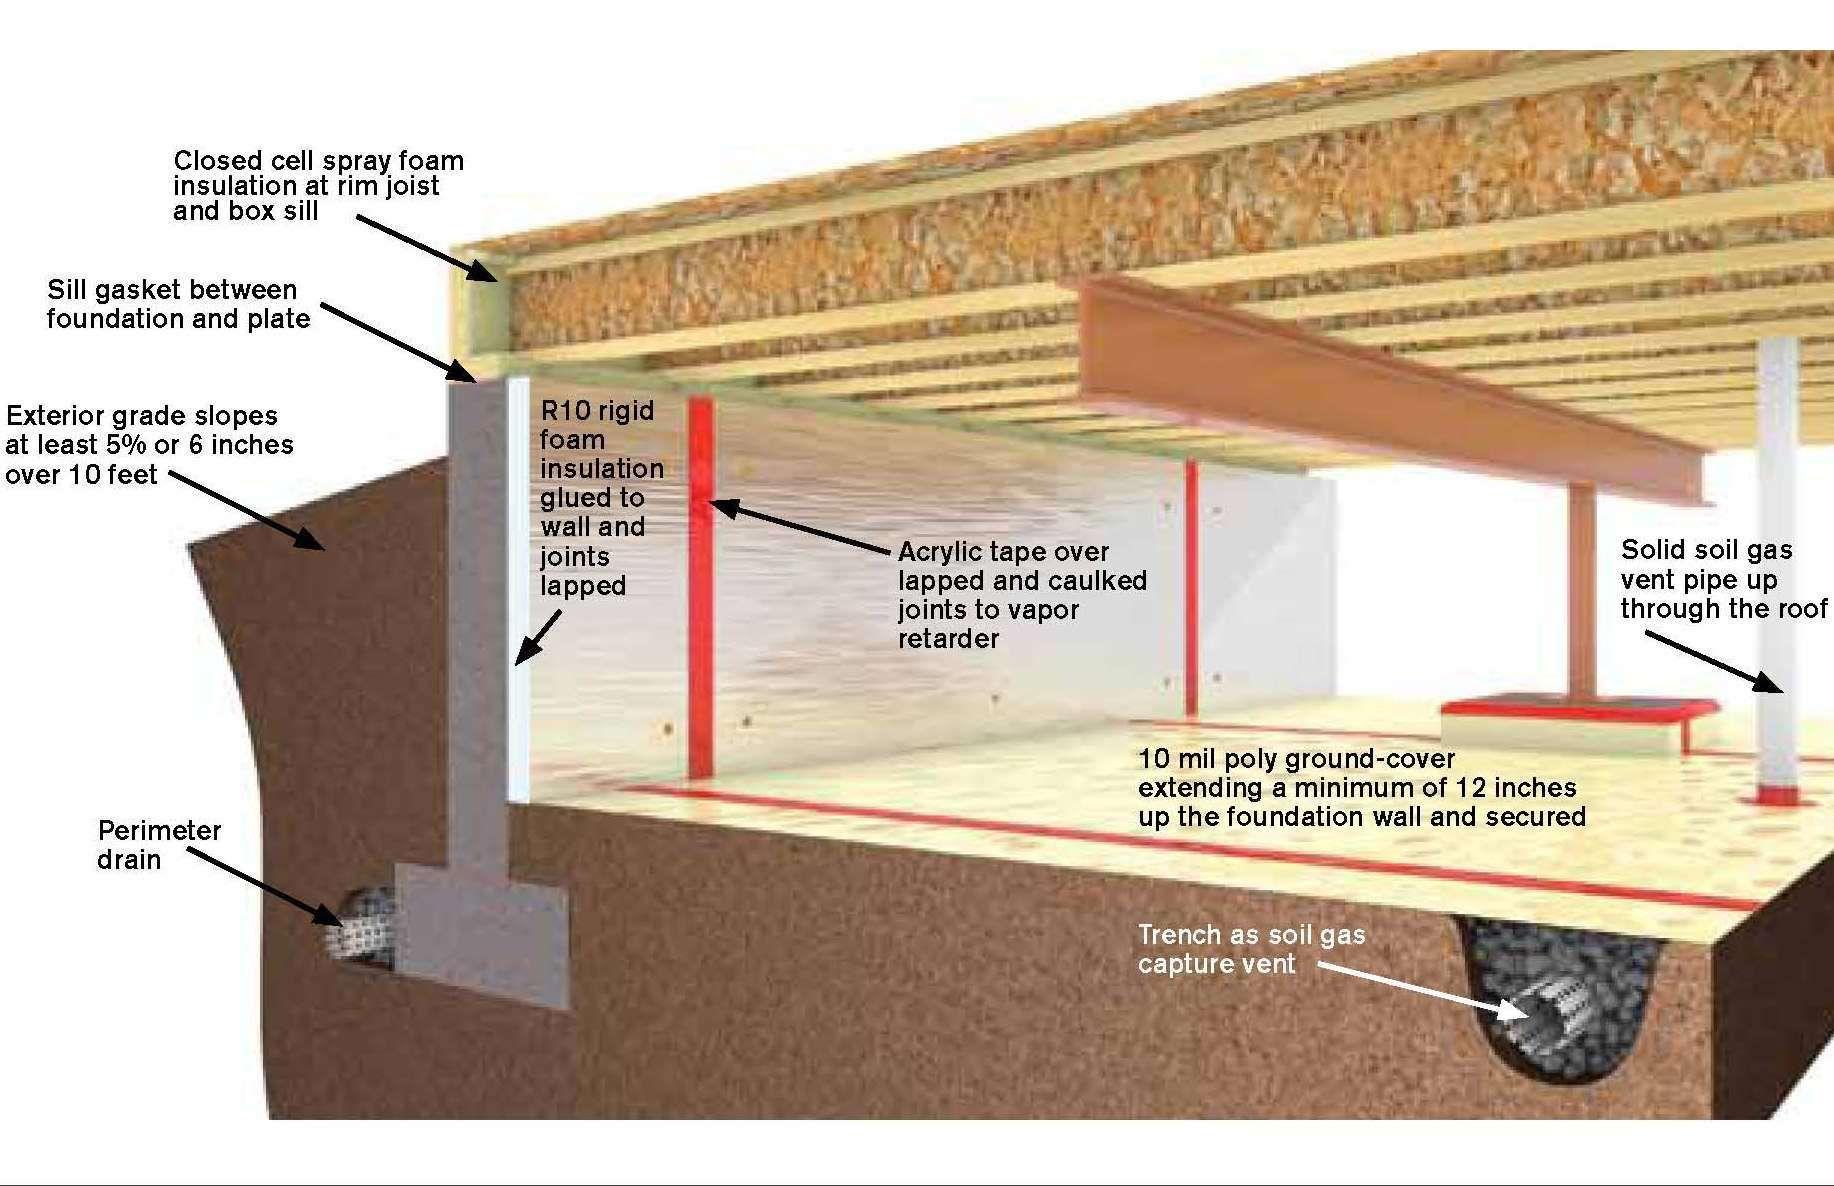 Conditioning crawlspaces Sealed crawl space, Spray foam